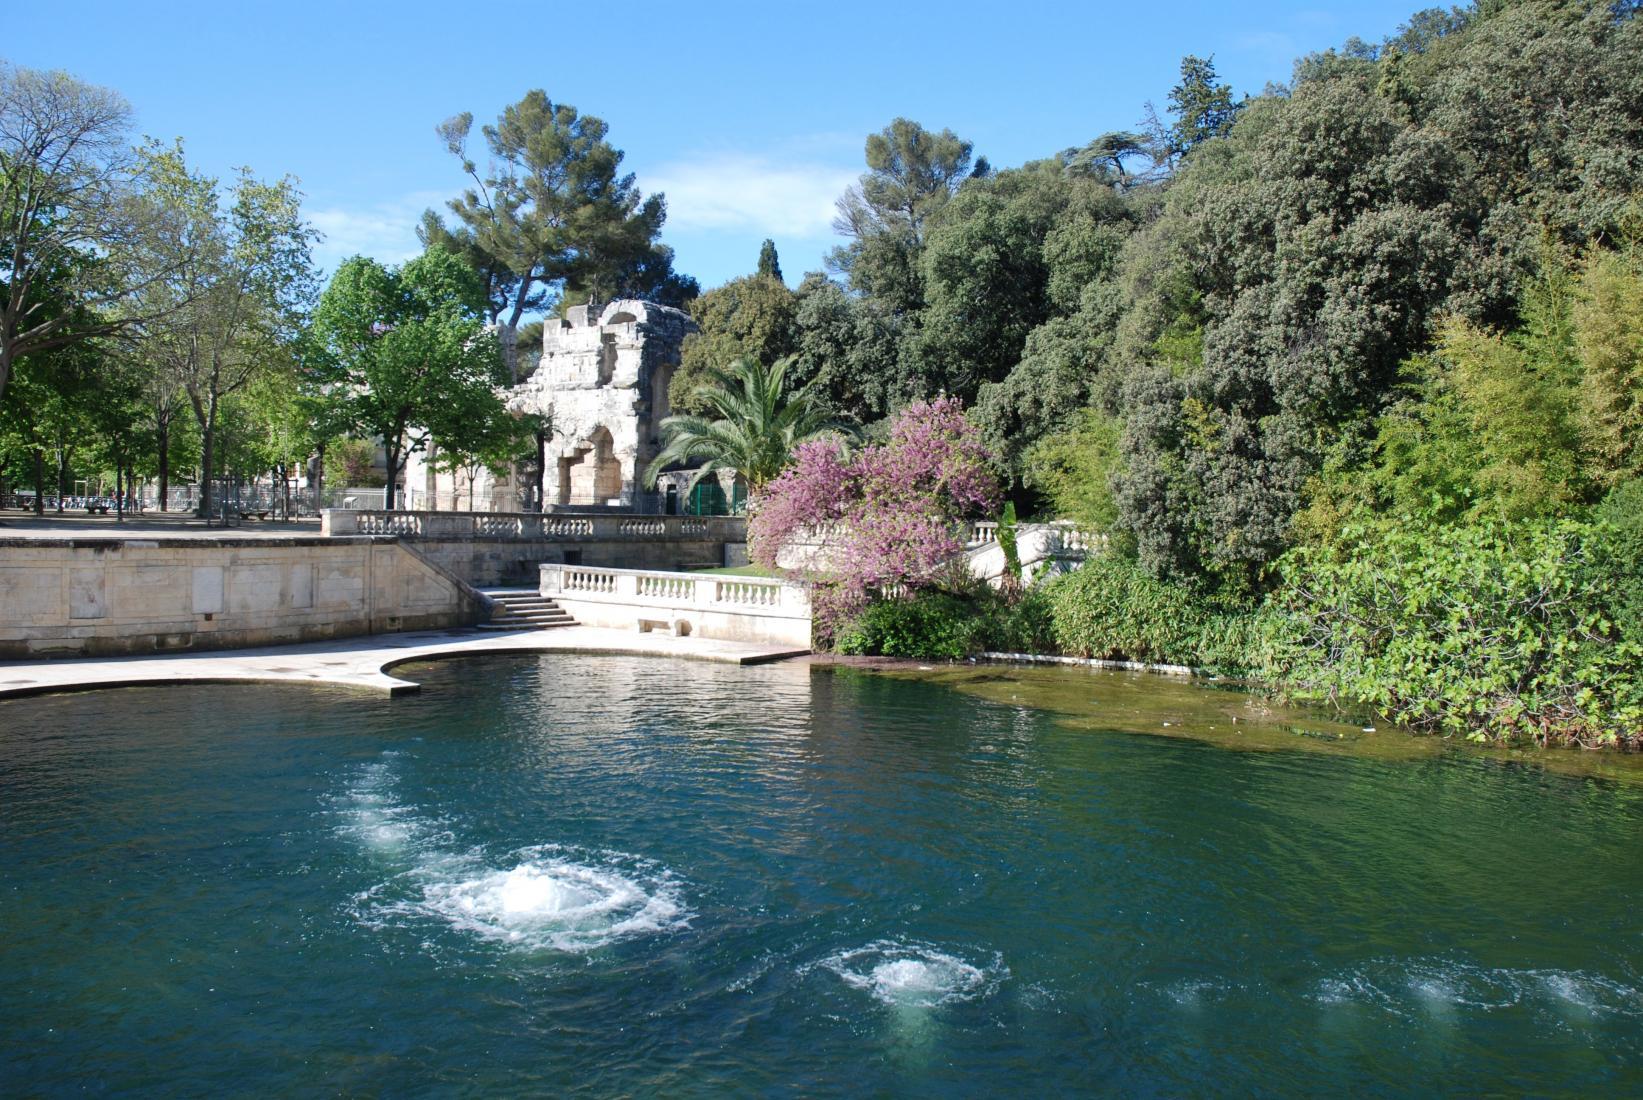 APJLR - Jardins de la Fontaine